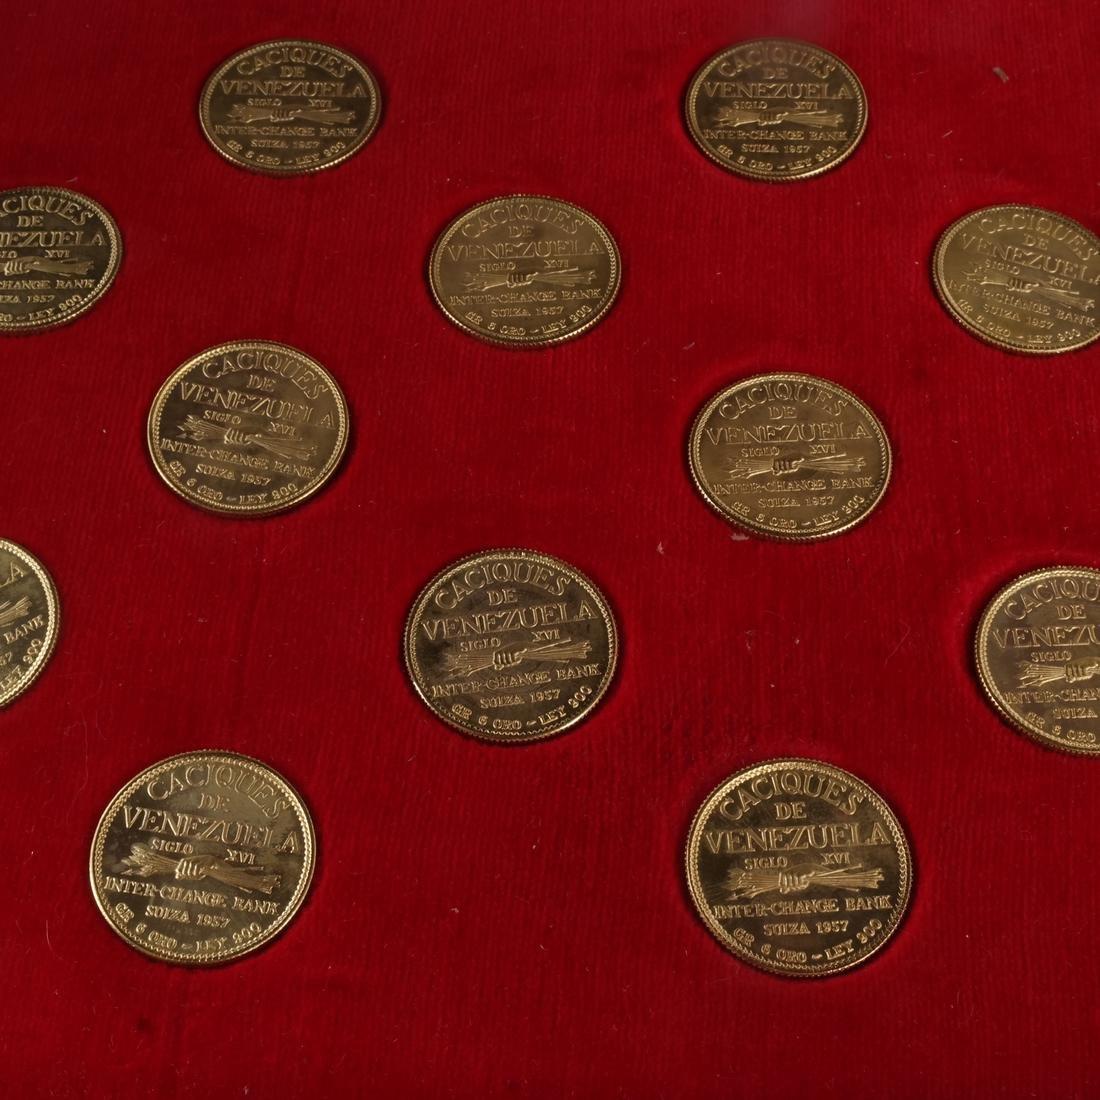 Venezuela Gold Set, 18 Coins, 1957 - 5